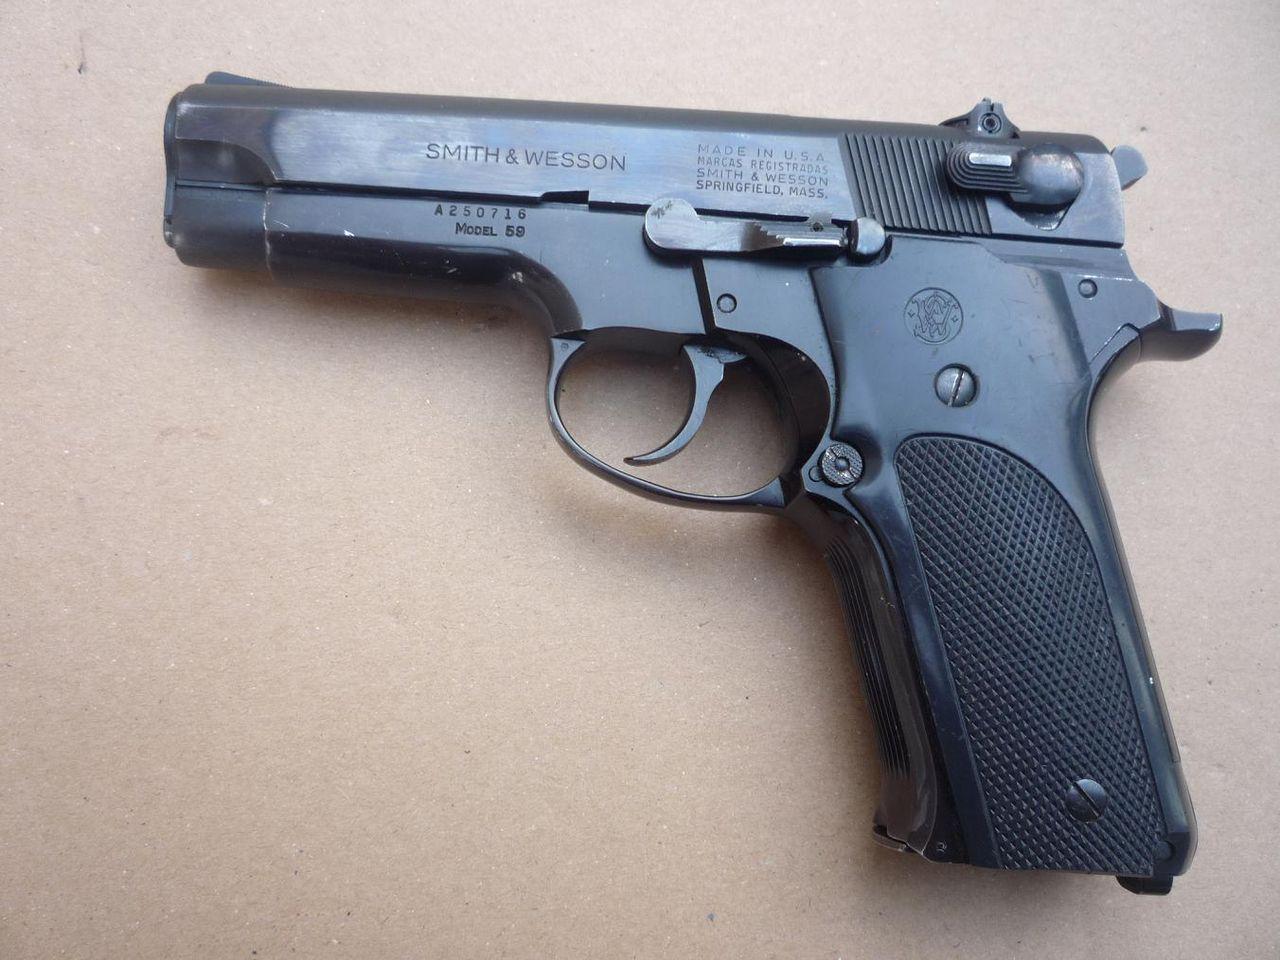 Конструкция пистолета «Smith & Wesson» 59